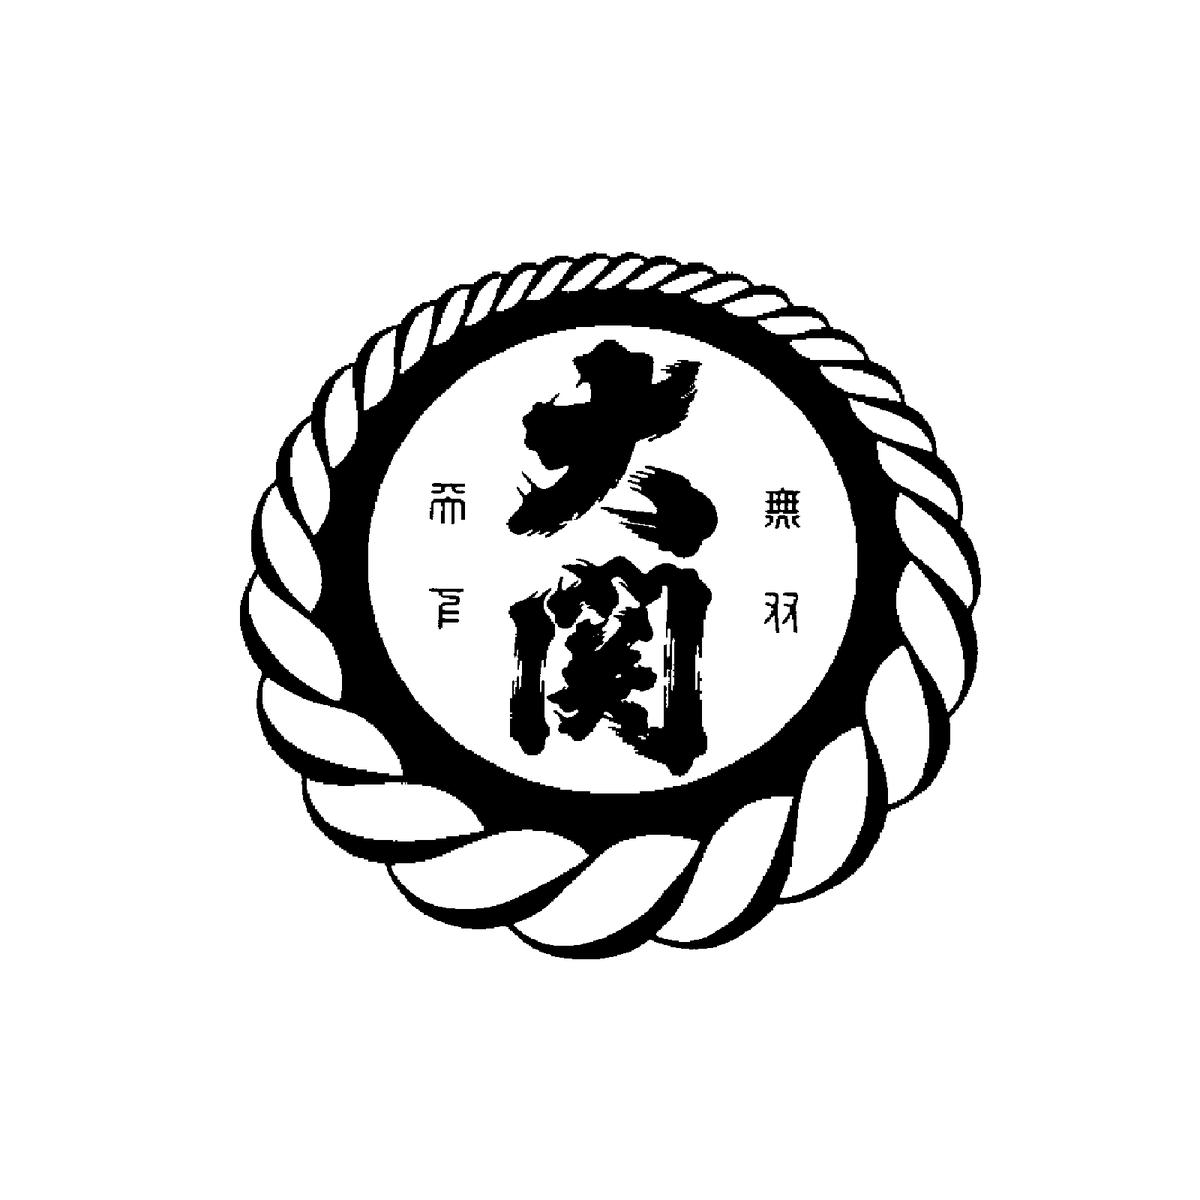 test ツイッターメディア - [商願2020-137401] 商標:[画像] / 出願人:大関株式会社 / 出願日:2020年11月6日 / 区分:33(清酒,日本酒,焼酎,合成清酒,白酒,直し,みりん,洋酒,果実酒,酎ハイ,中国酒,薬味酒) https://t.co/Ied65HHcfg